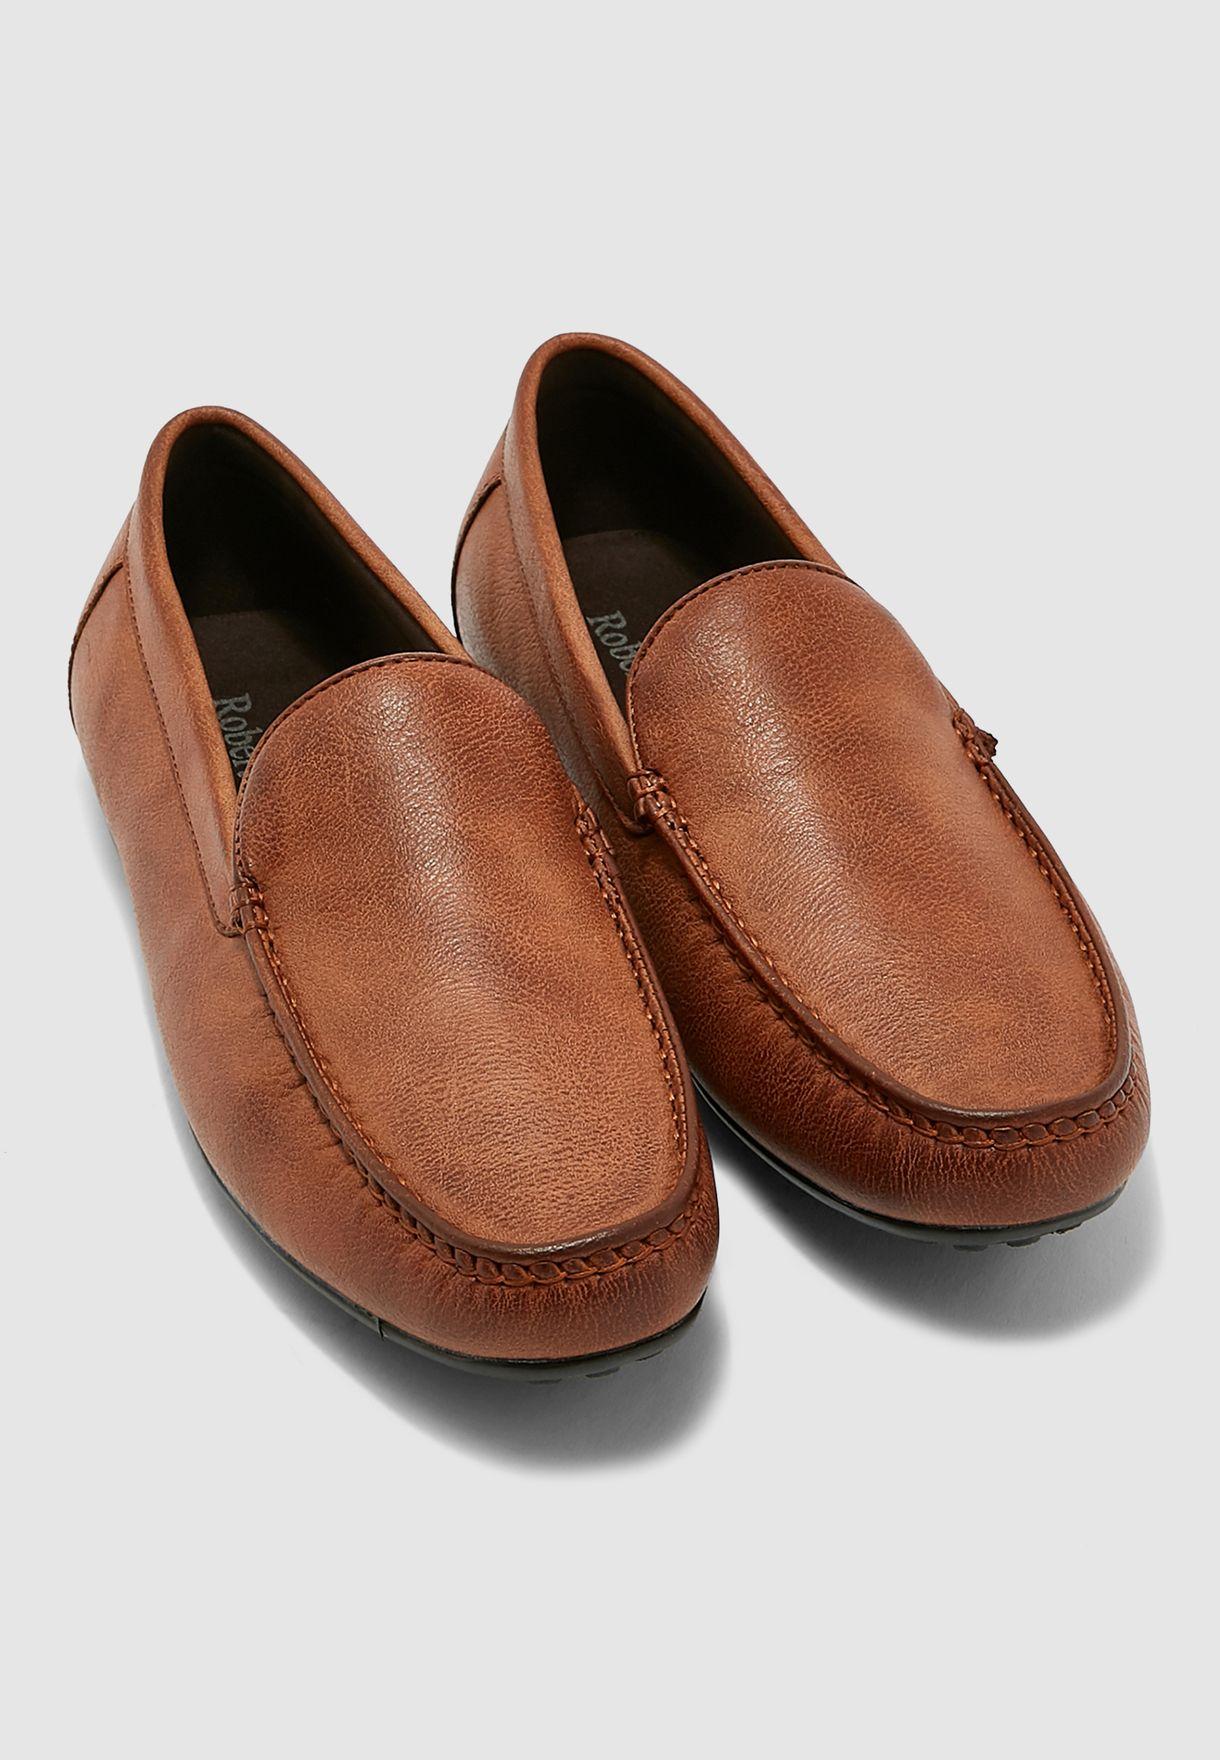 حذاء مزين بدرزات